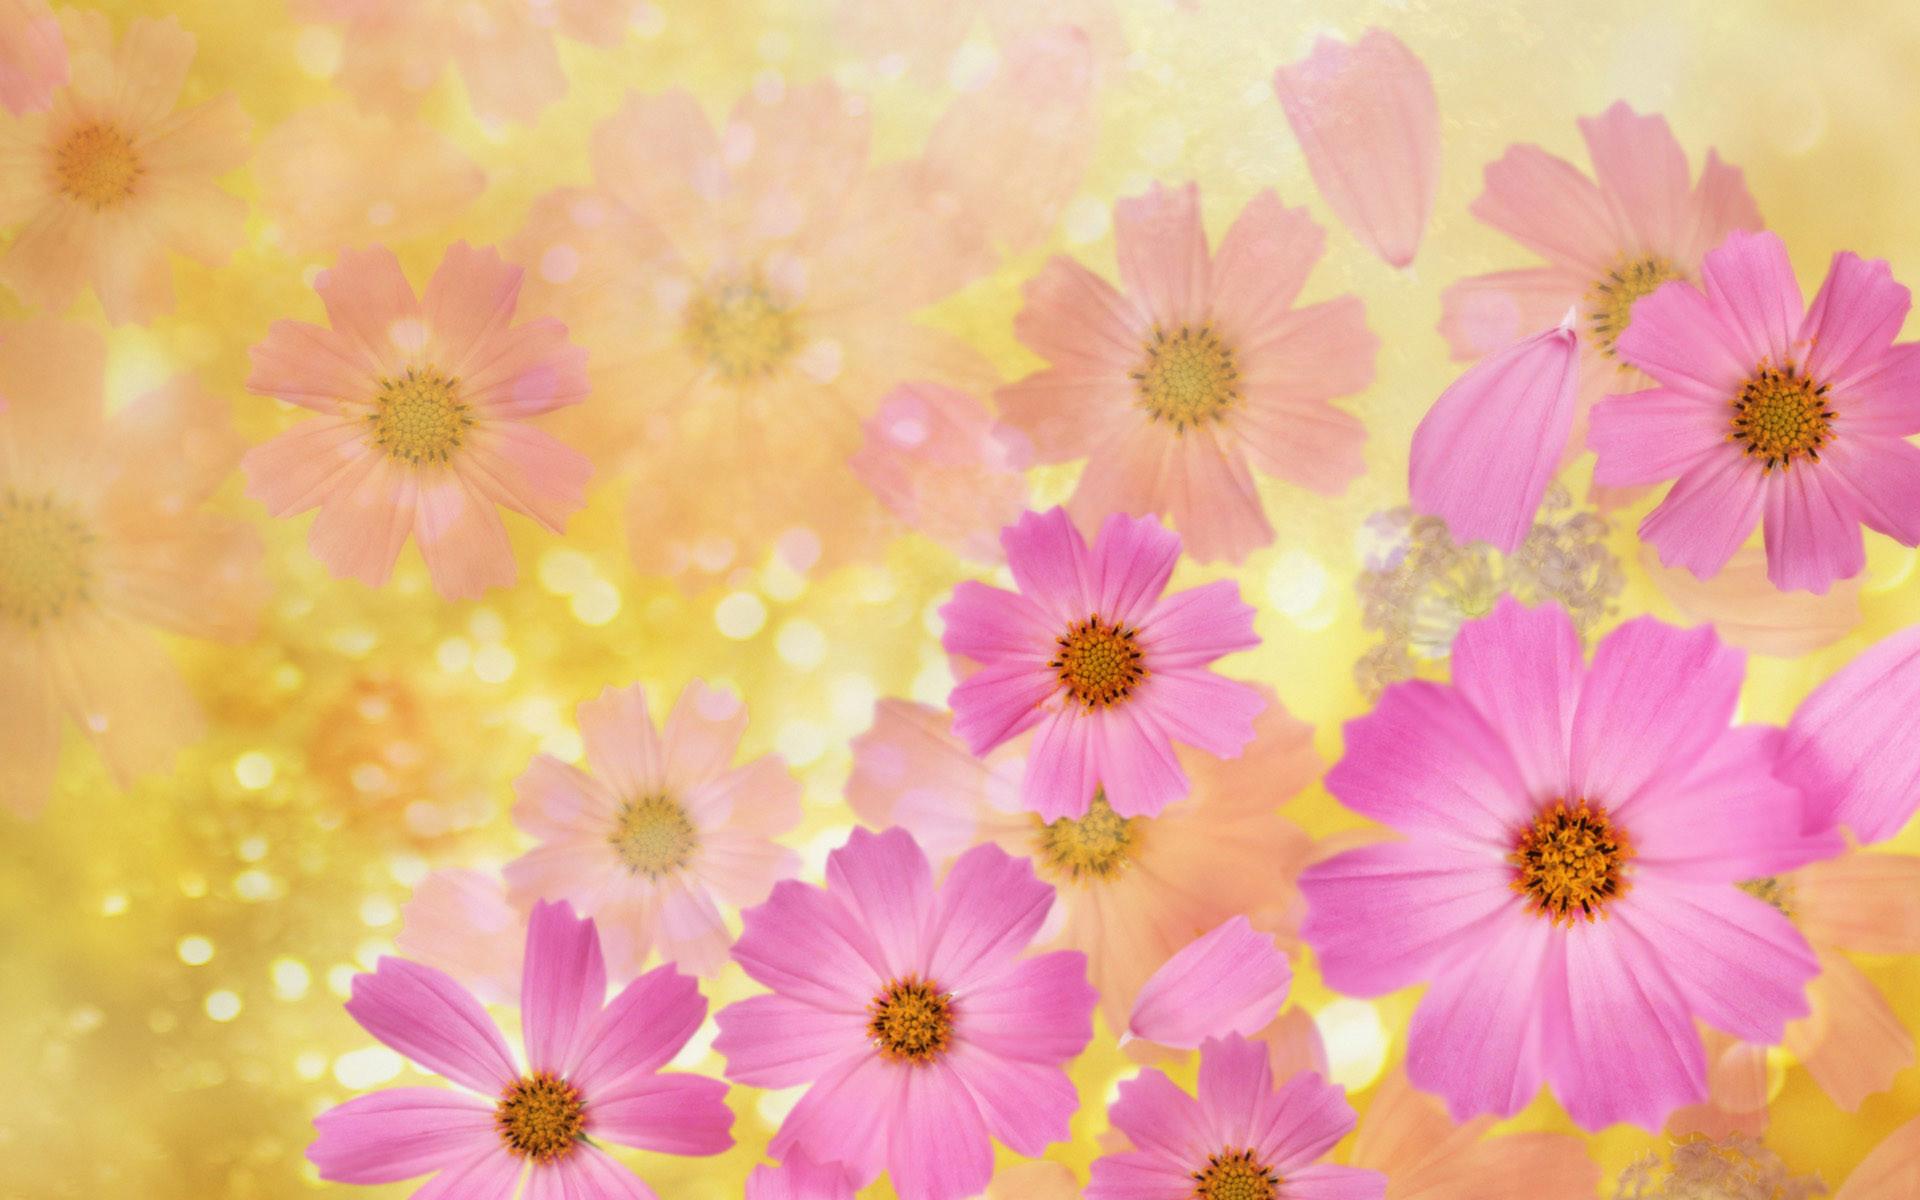 Widescreen HD Wallpaper > Themes > Beautiful spring flowers   High .